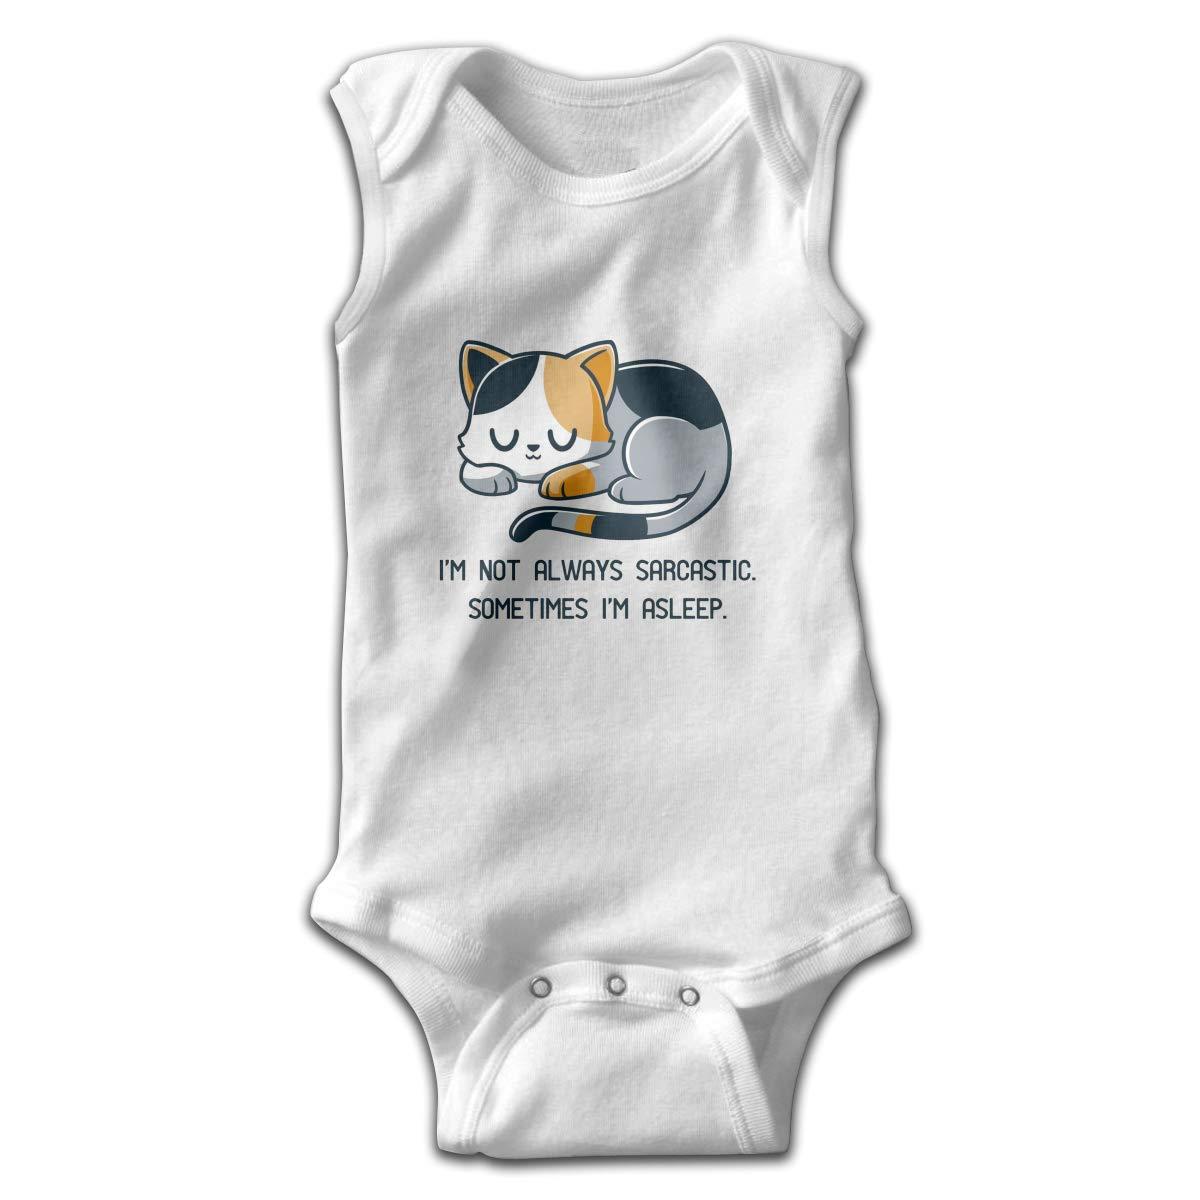 Im NOT Always Sarcastic Smalls Baby Onesie,Infant Bodysuit Black